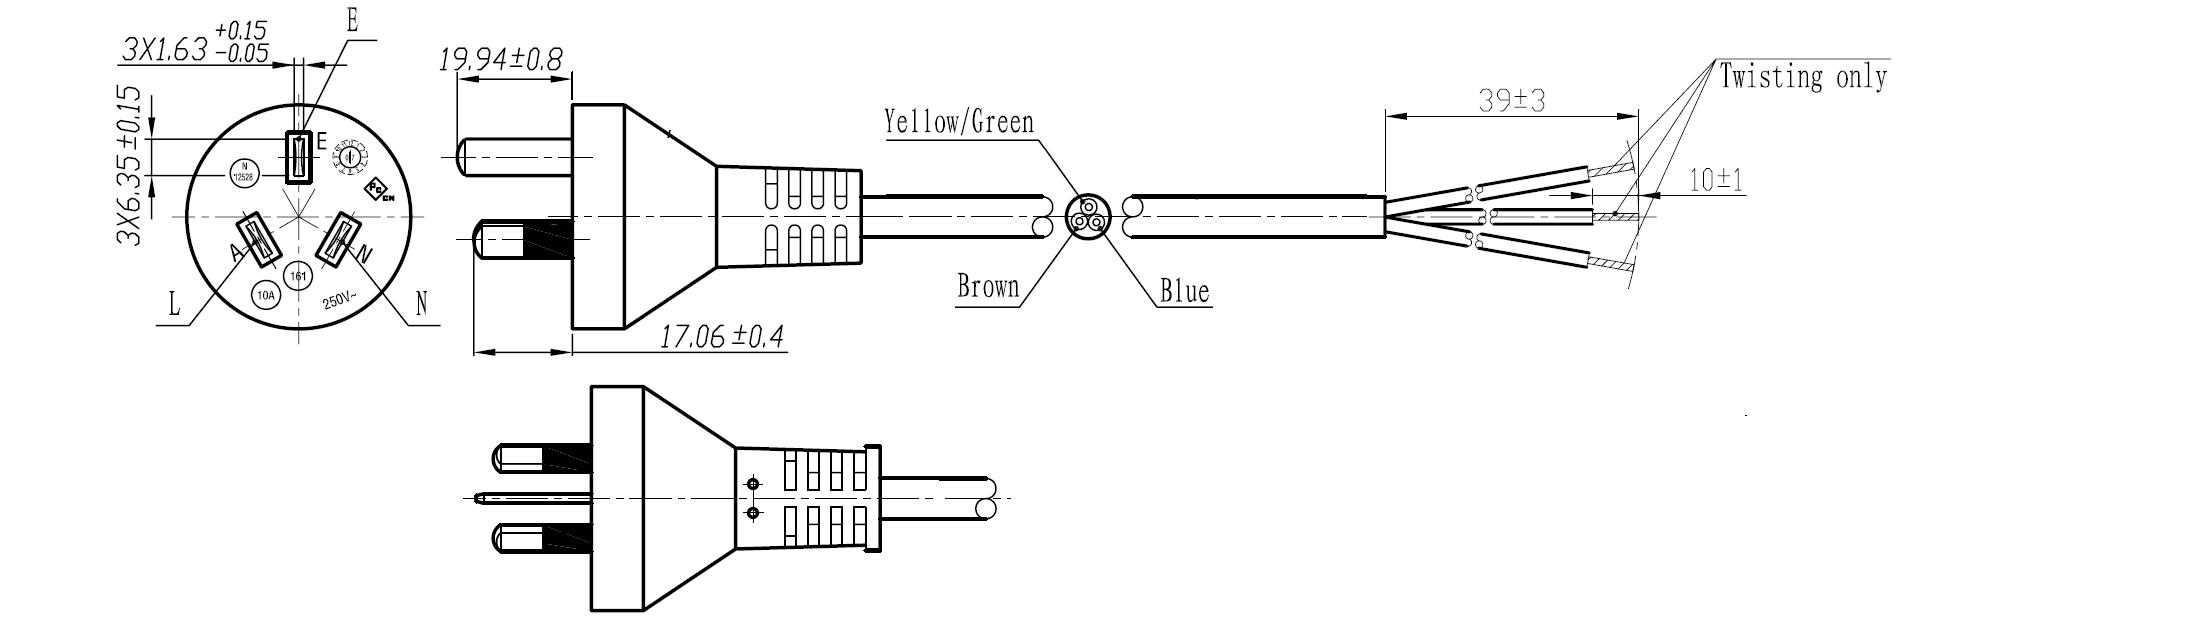 Australia Power Cords | MEGA ELECTRONICS, INC. on three pin plug, 10a 250v power cord, 10a 125v plug, 10a 250v fuse, power plug, 10a 250v adapter usa,